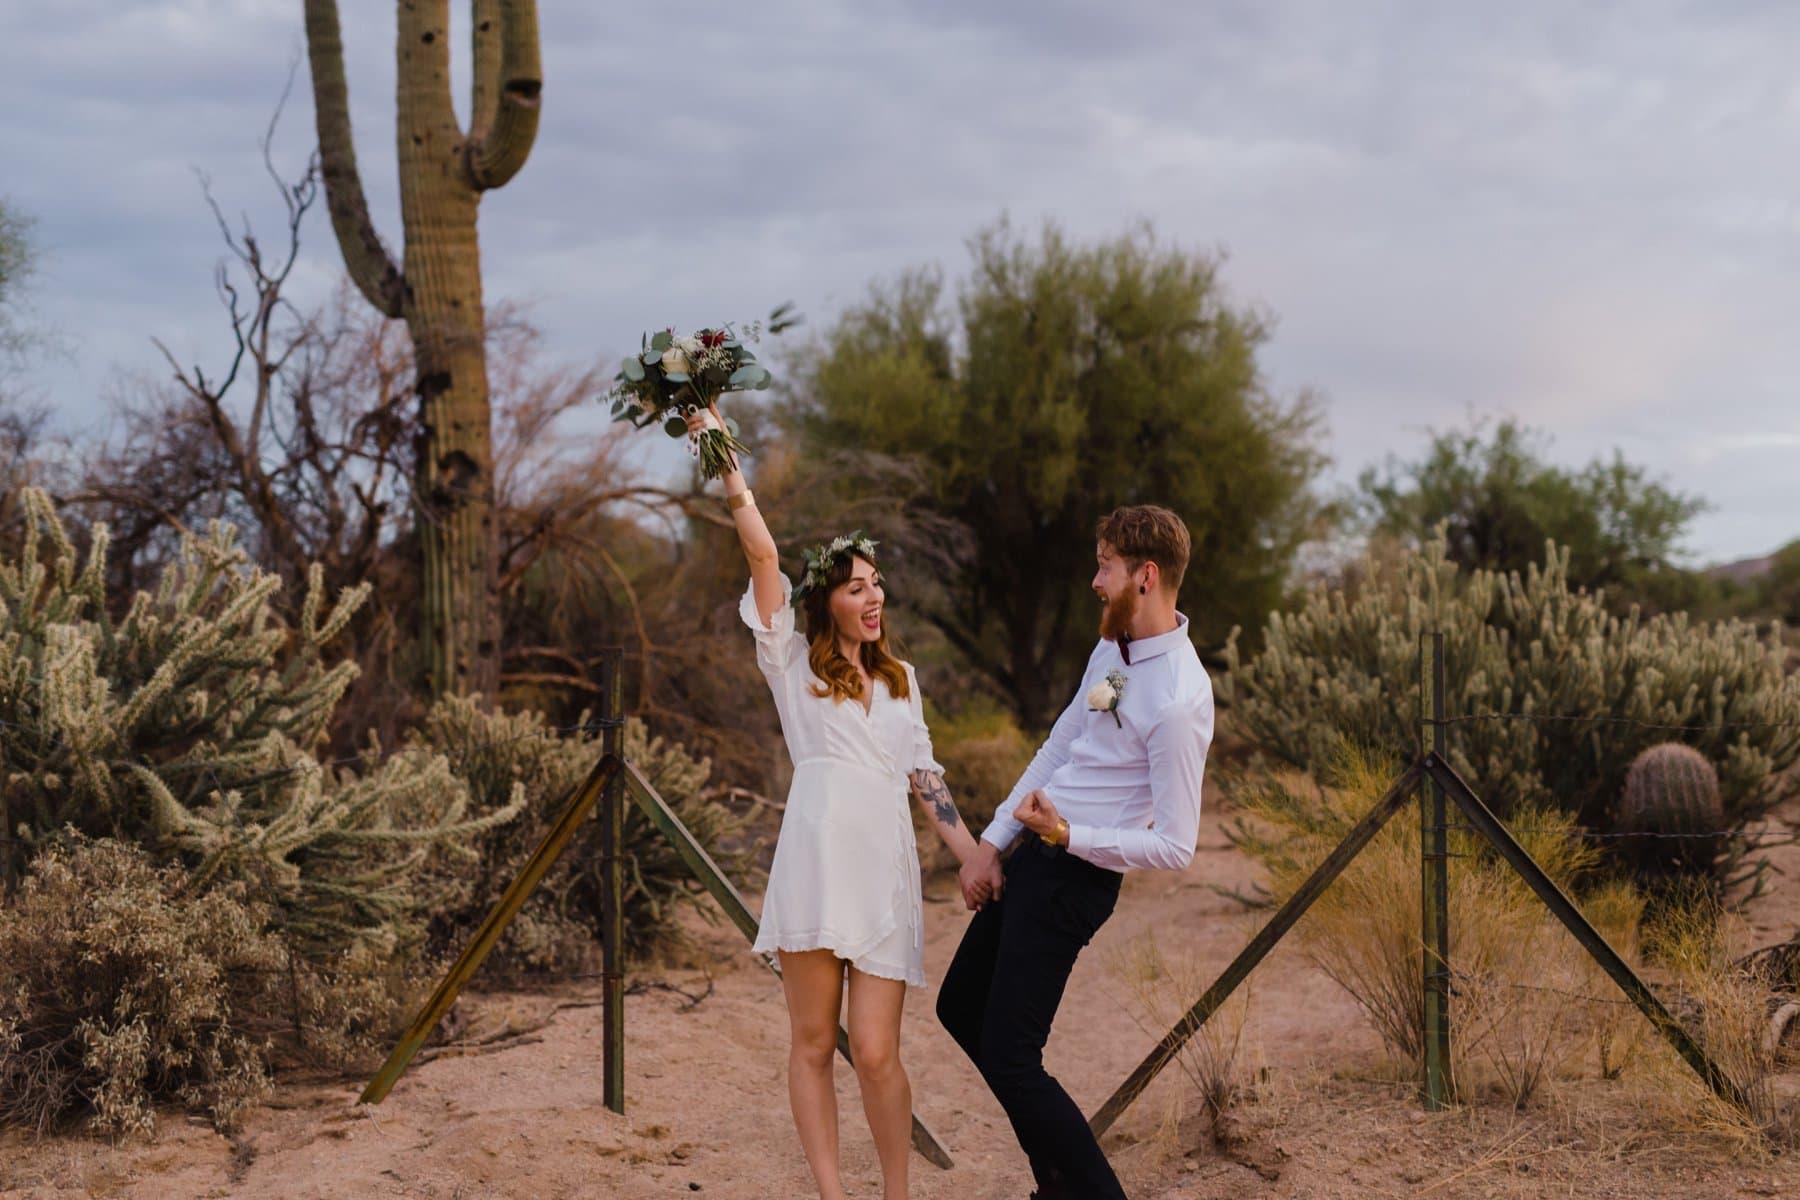 joyful cute outdoor elopement in the desert Arizona